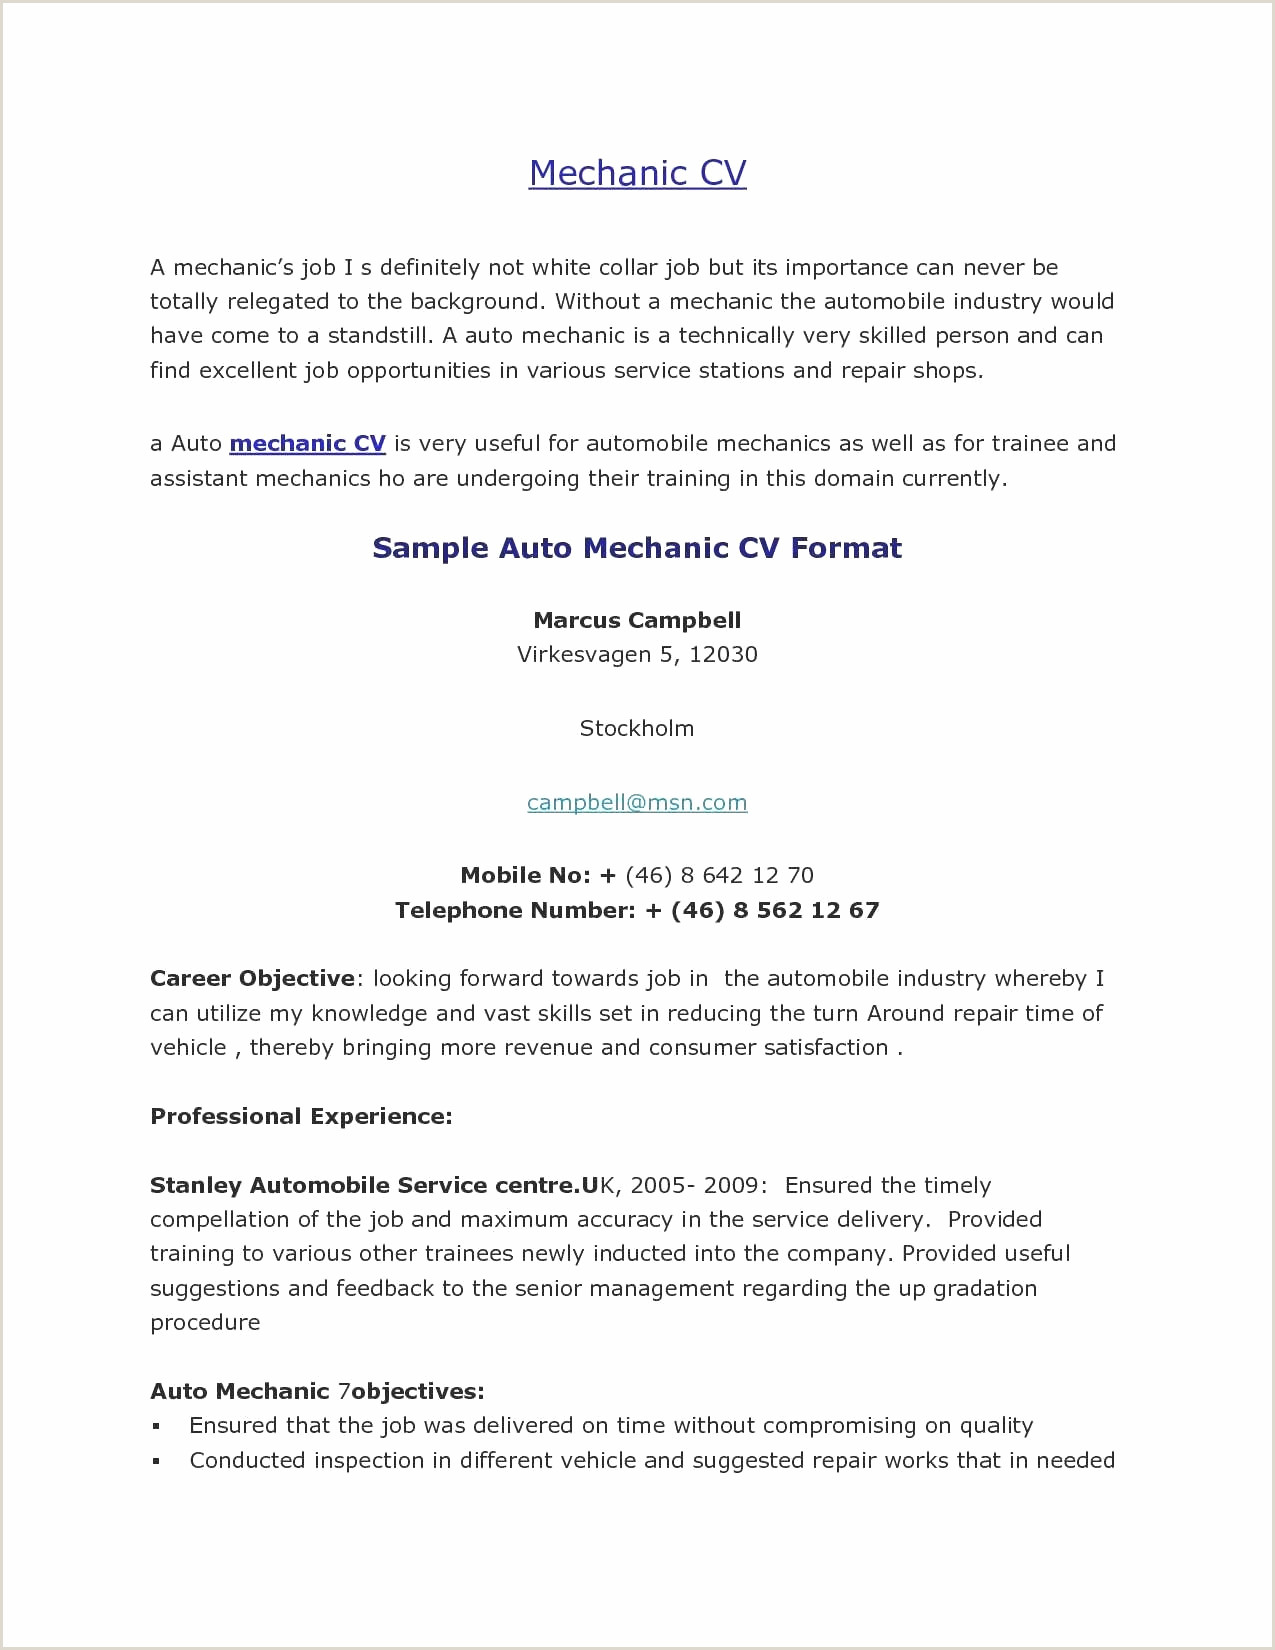 Resume top Model Inspirant Objectives Examples for Cv Best